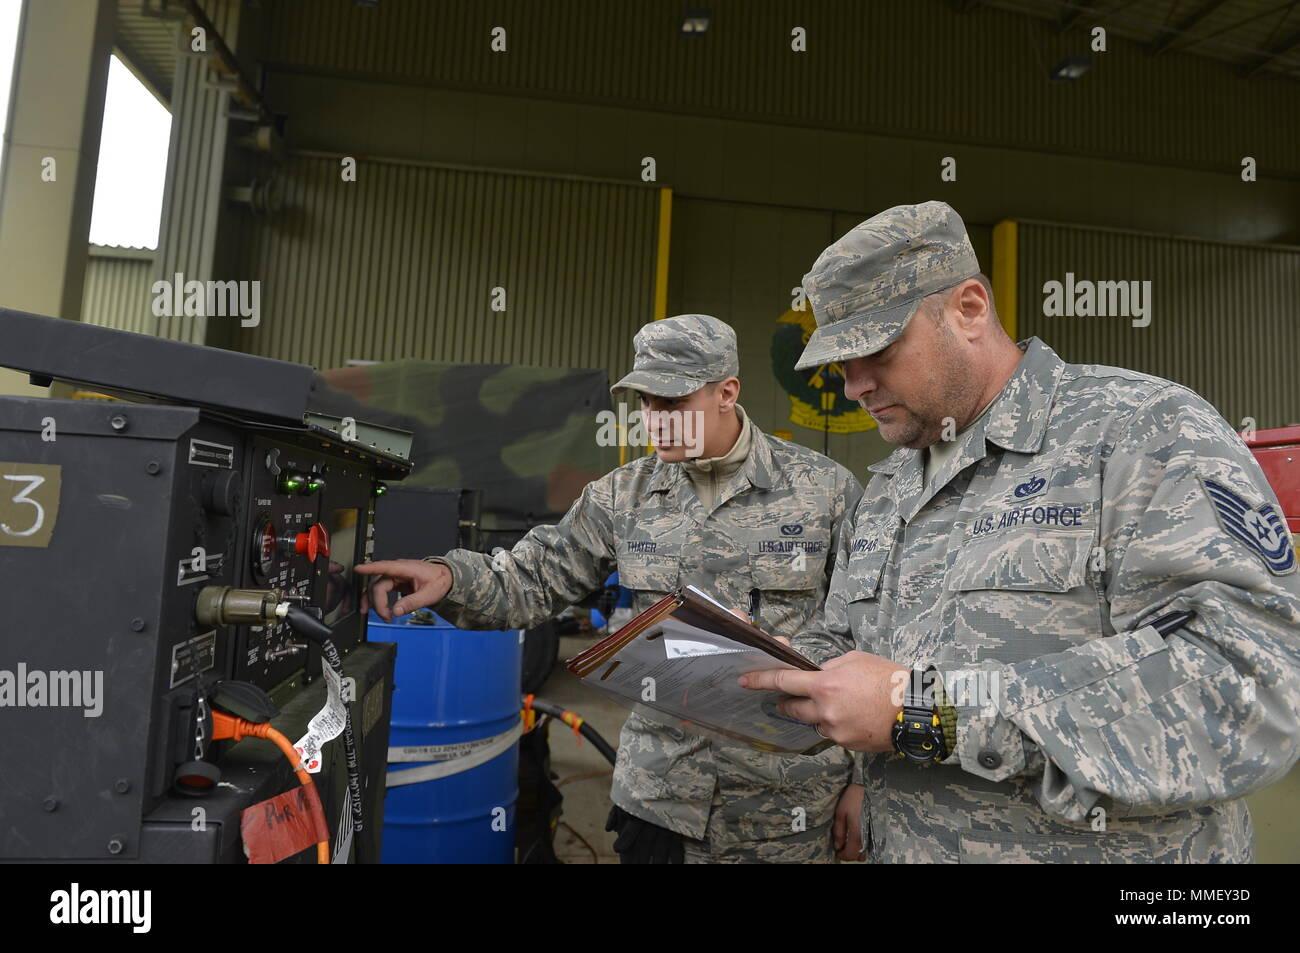 U S  Air Force Tech  Sgt  James Kamrar, 1st Combat